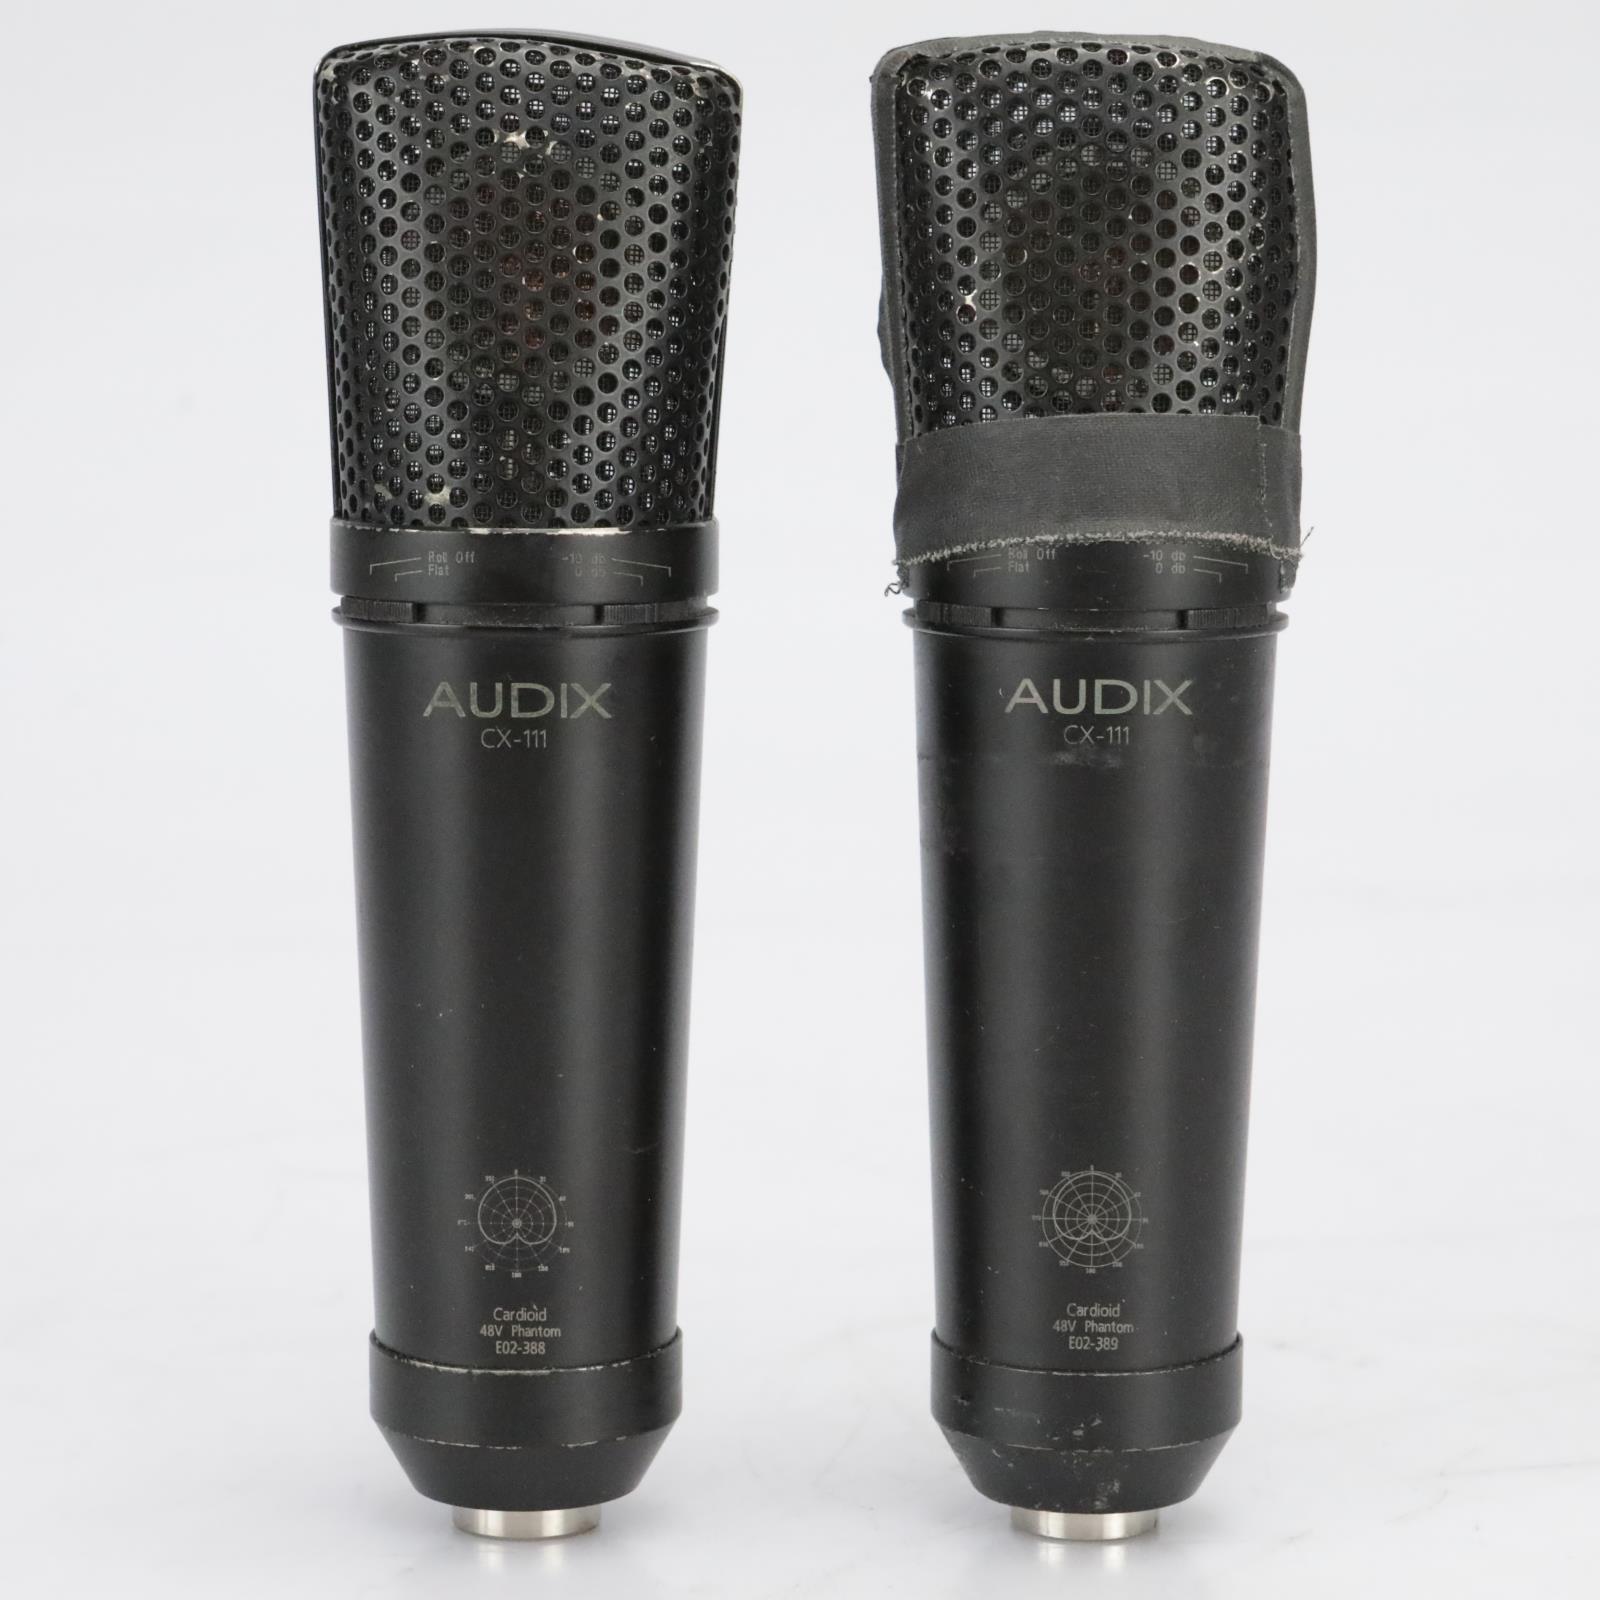 2 Audix CX-111 Large-Diaphragm Condenser Microphones Stereo-Pair w/Case #41161